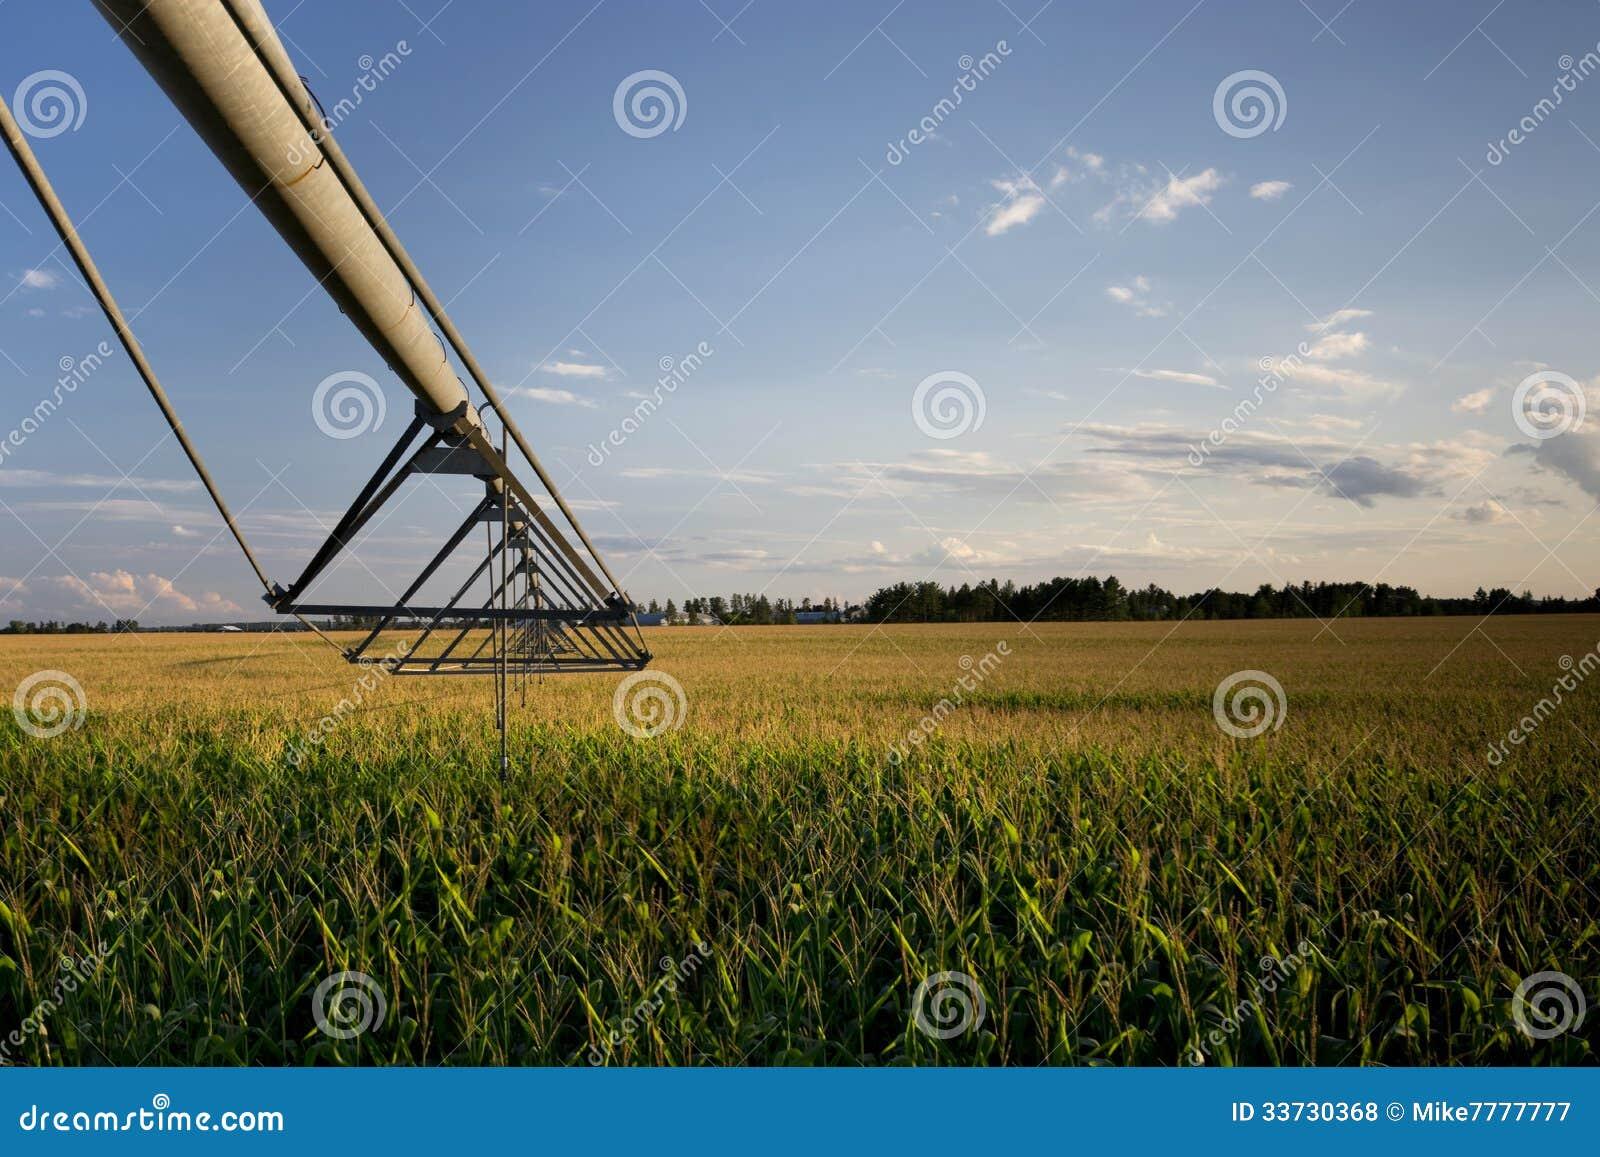 Irrigator над кукурузным полем, Midwest, США